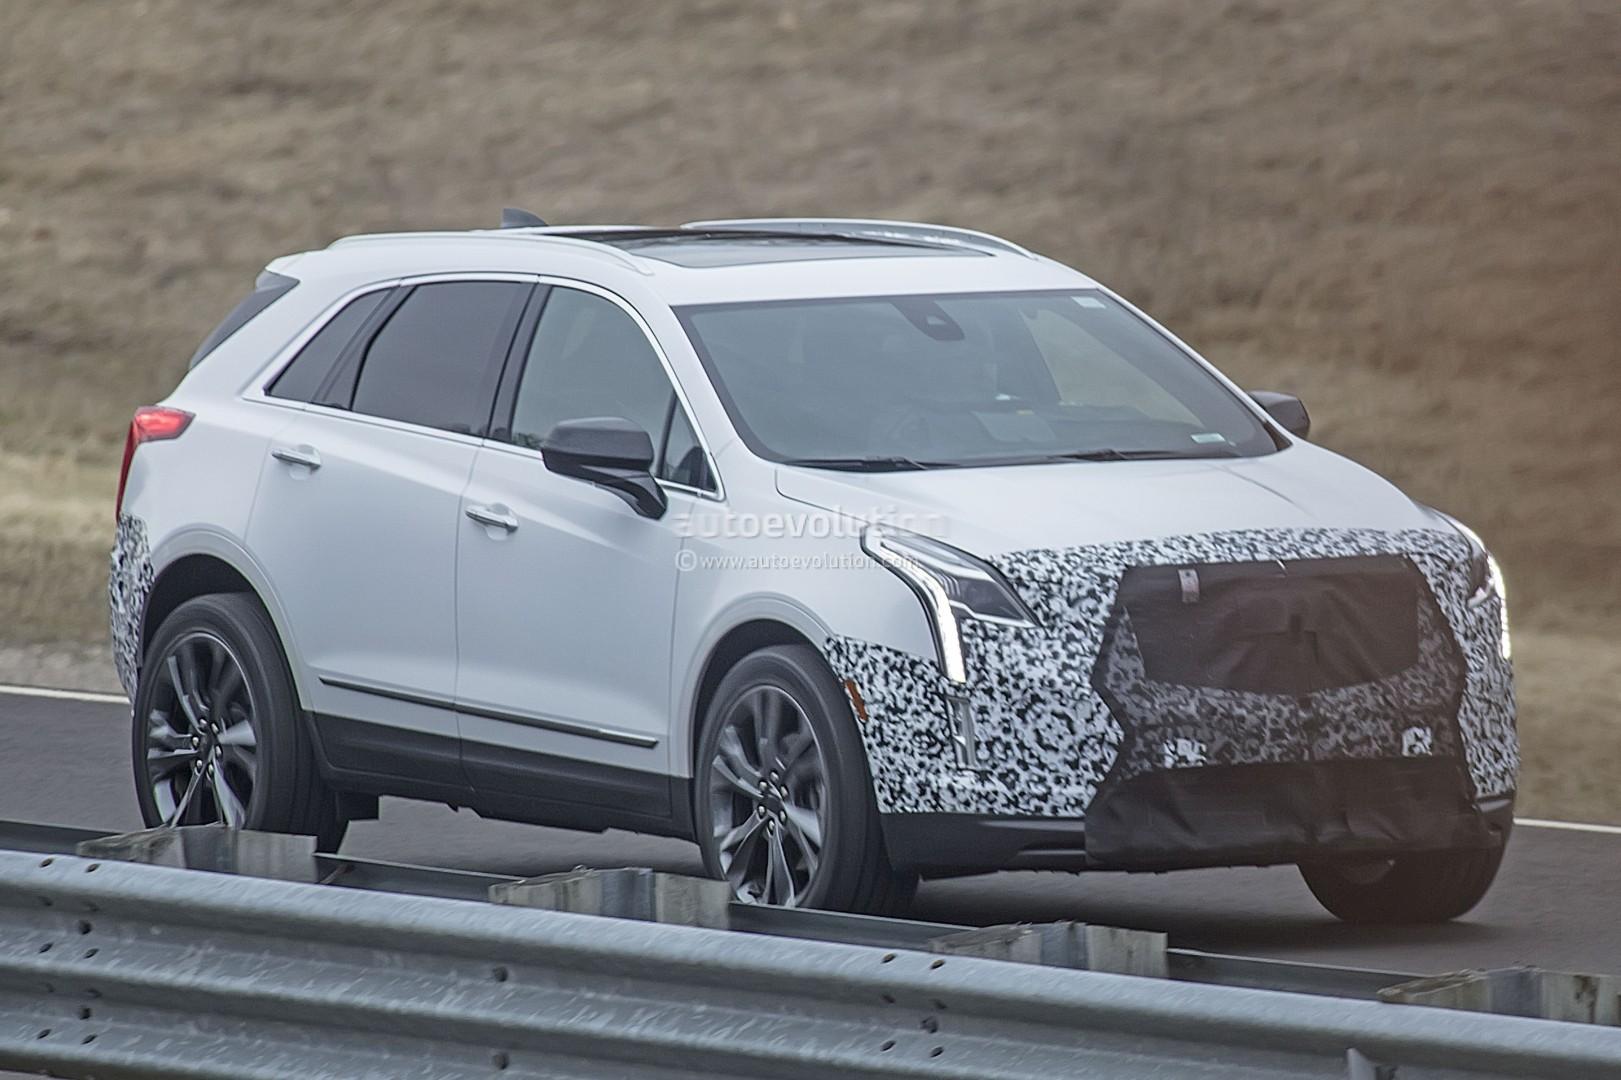 2020 Spy Shots Cadillac Xt5 Research New